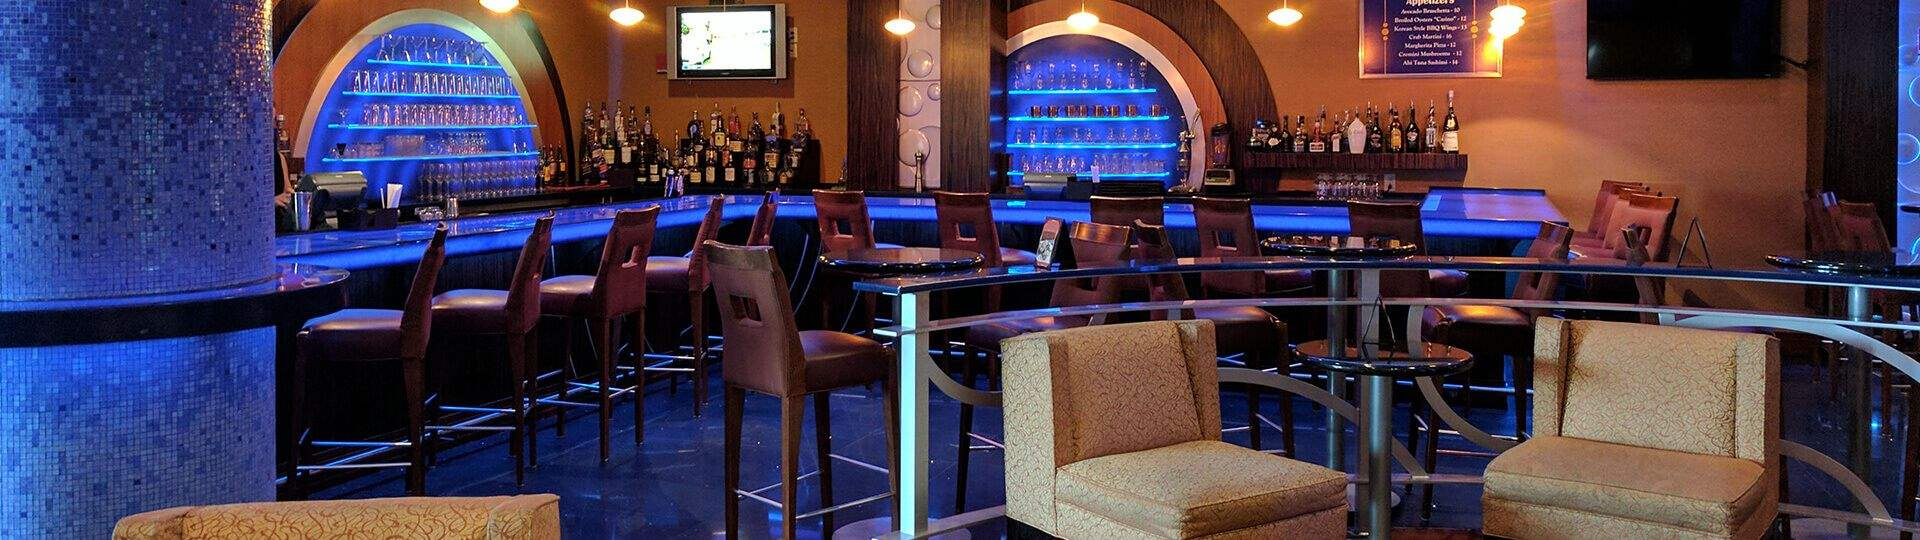 Luna Restaurant & Lounge, Florida - About Us